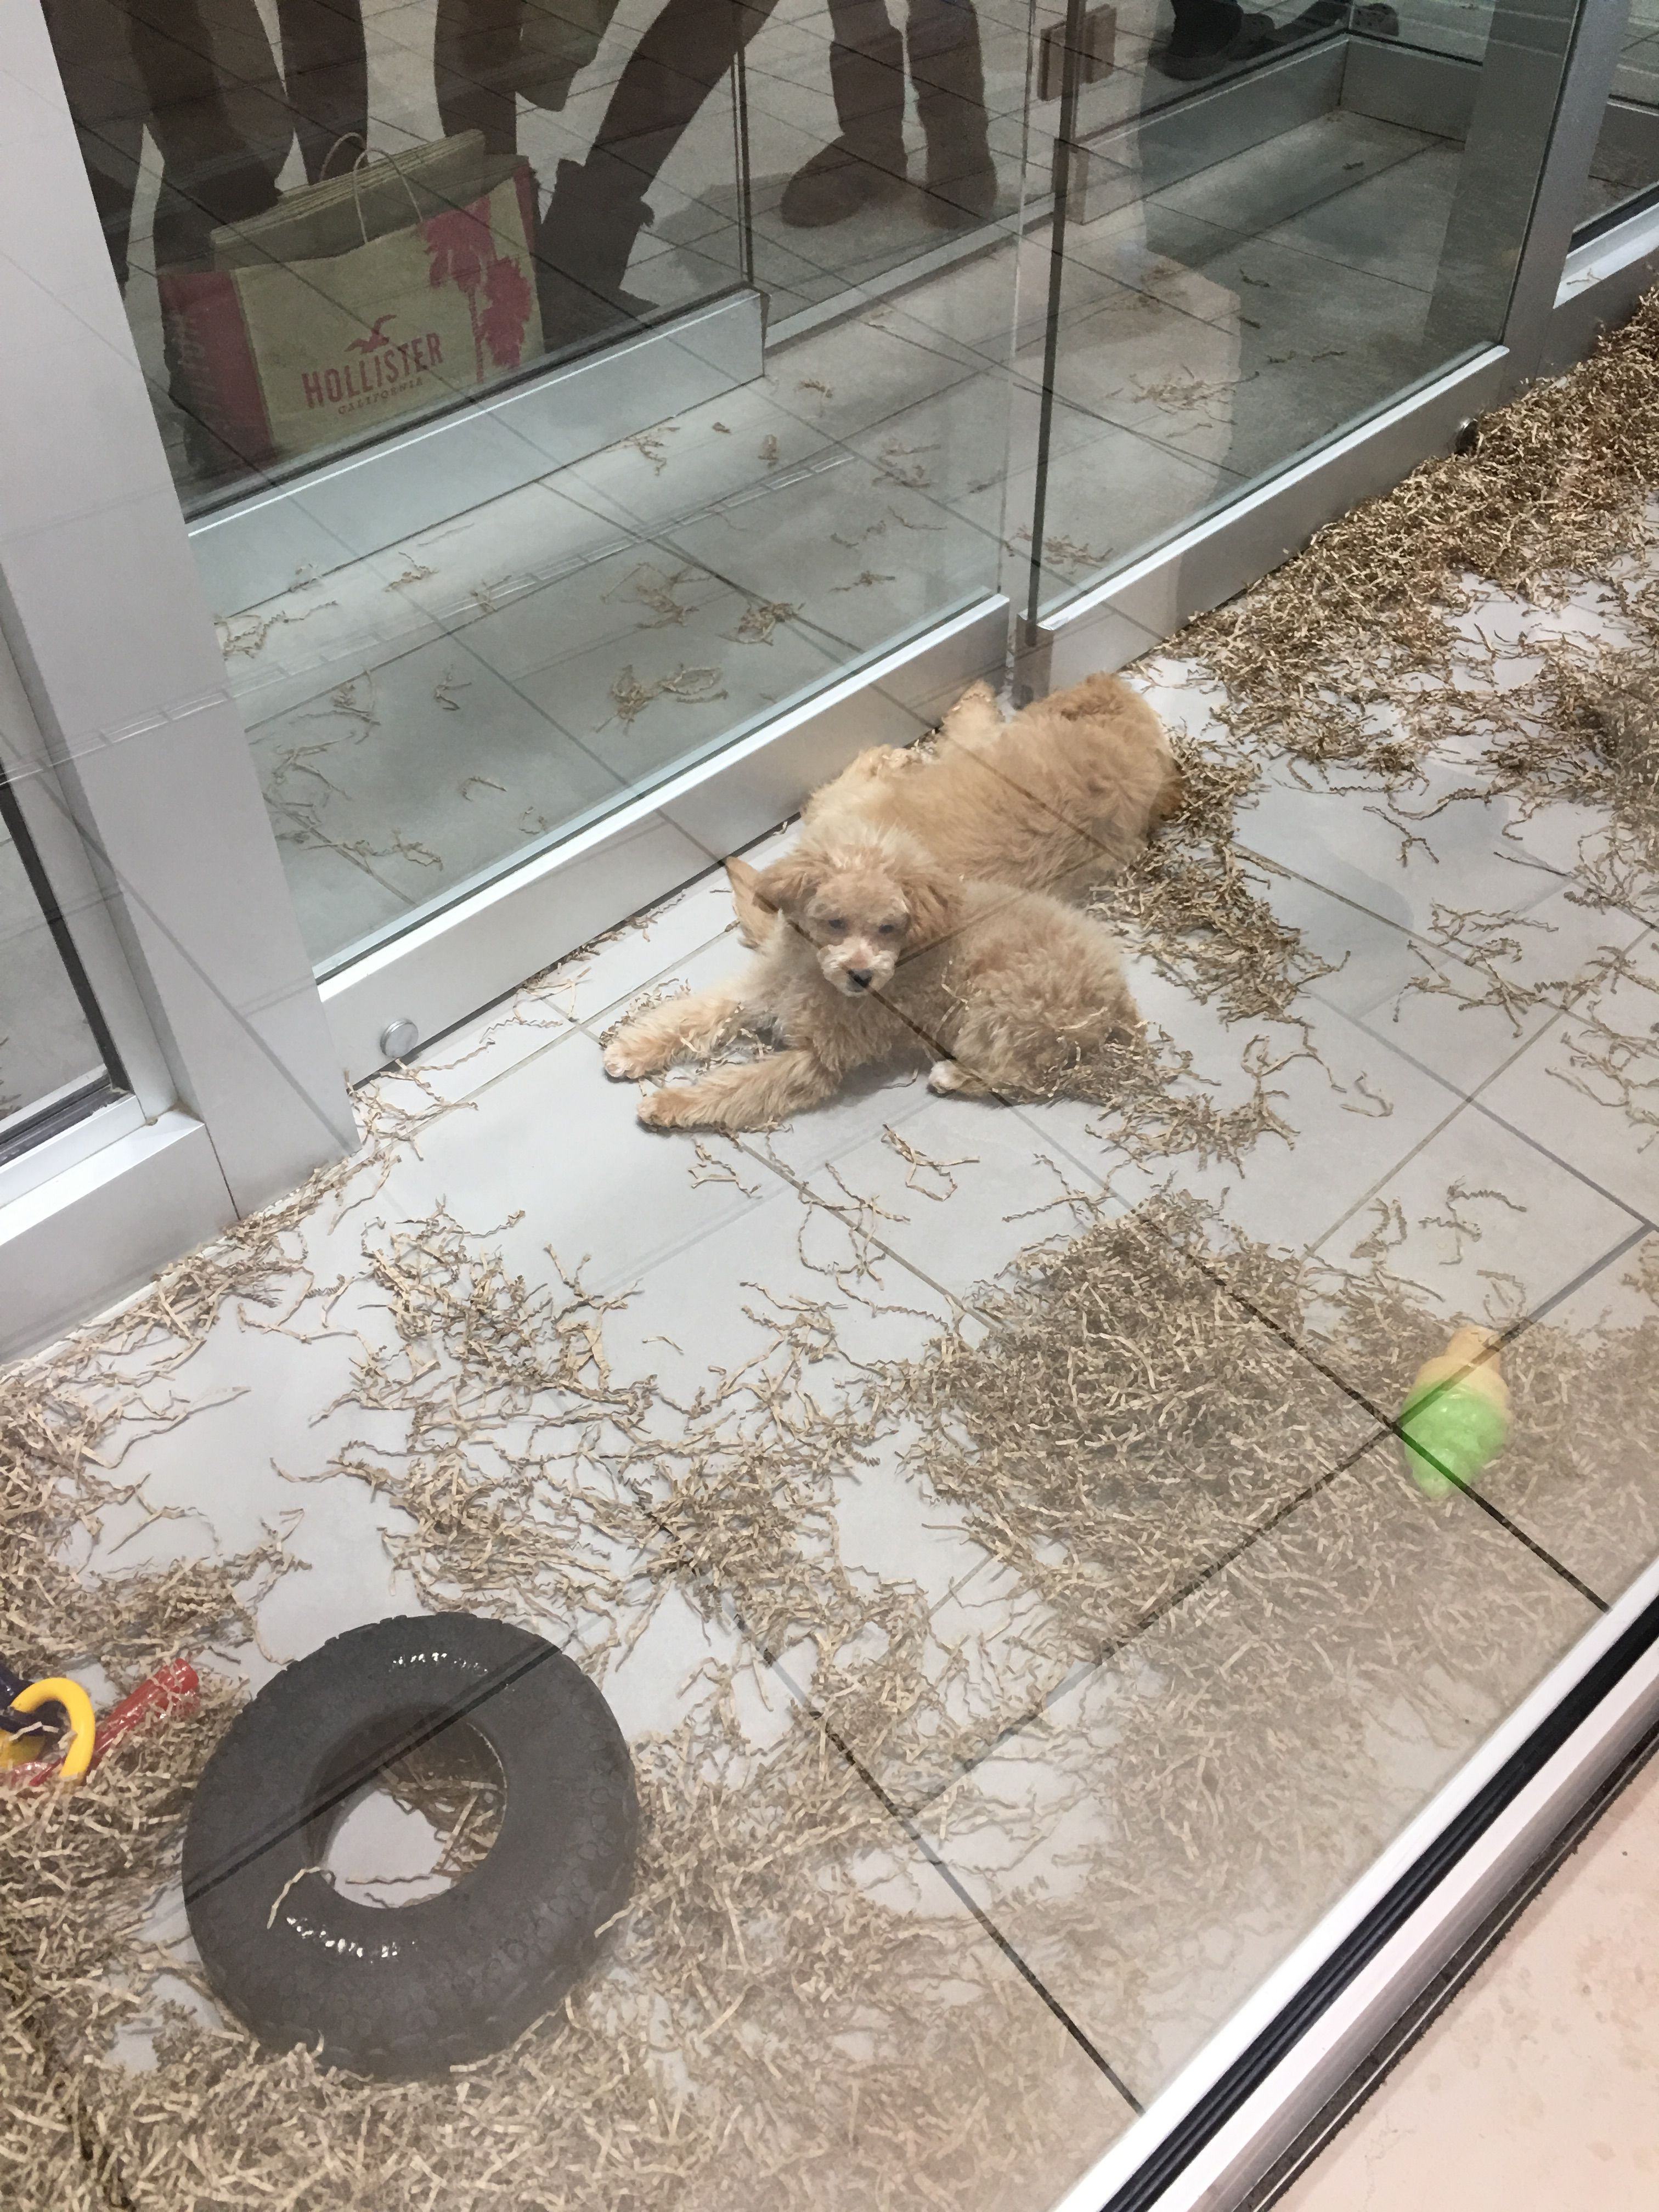 Bilder Mischlingshunde Kostenlos - Bilder Mischlingshunde Kostenlos